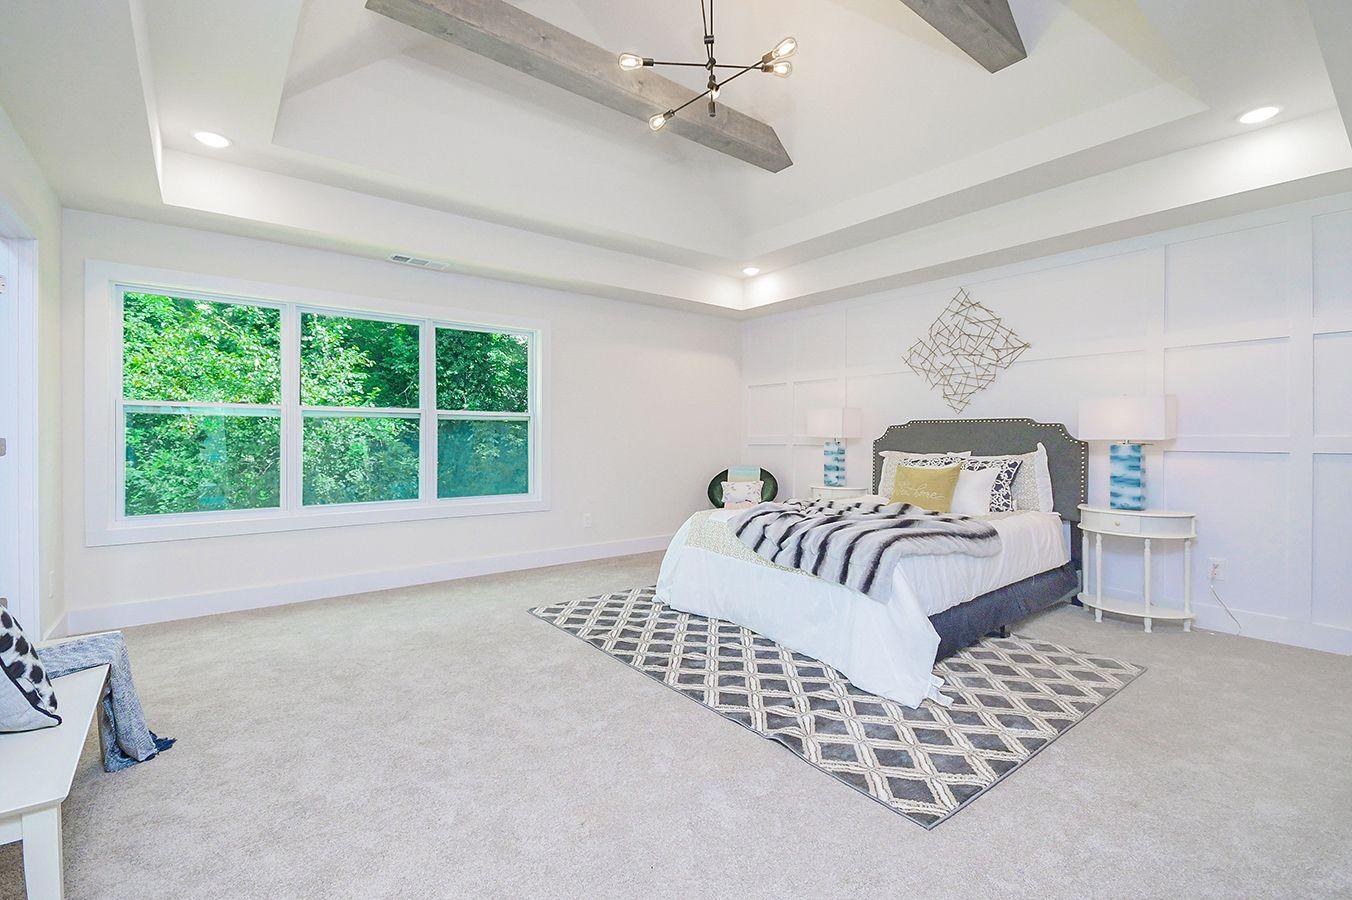 Upper_Level_Master_Bedroom_view1 (3).jpg